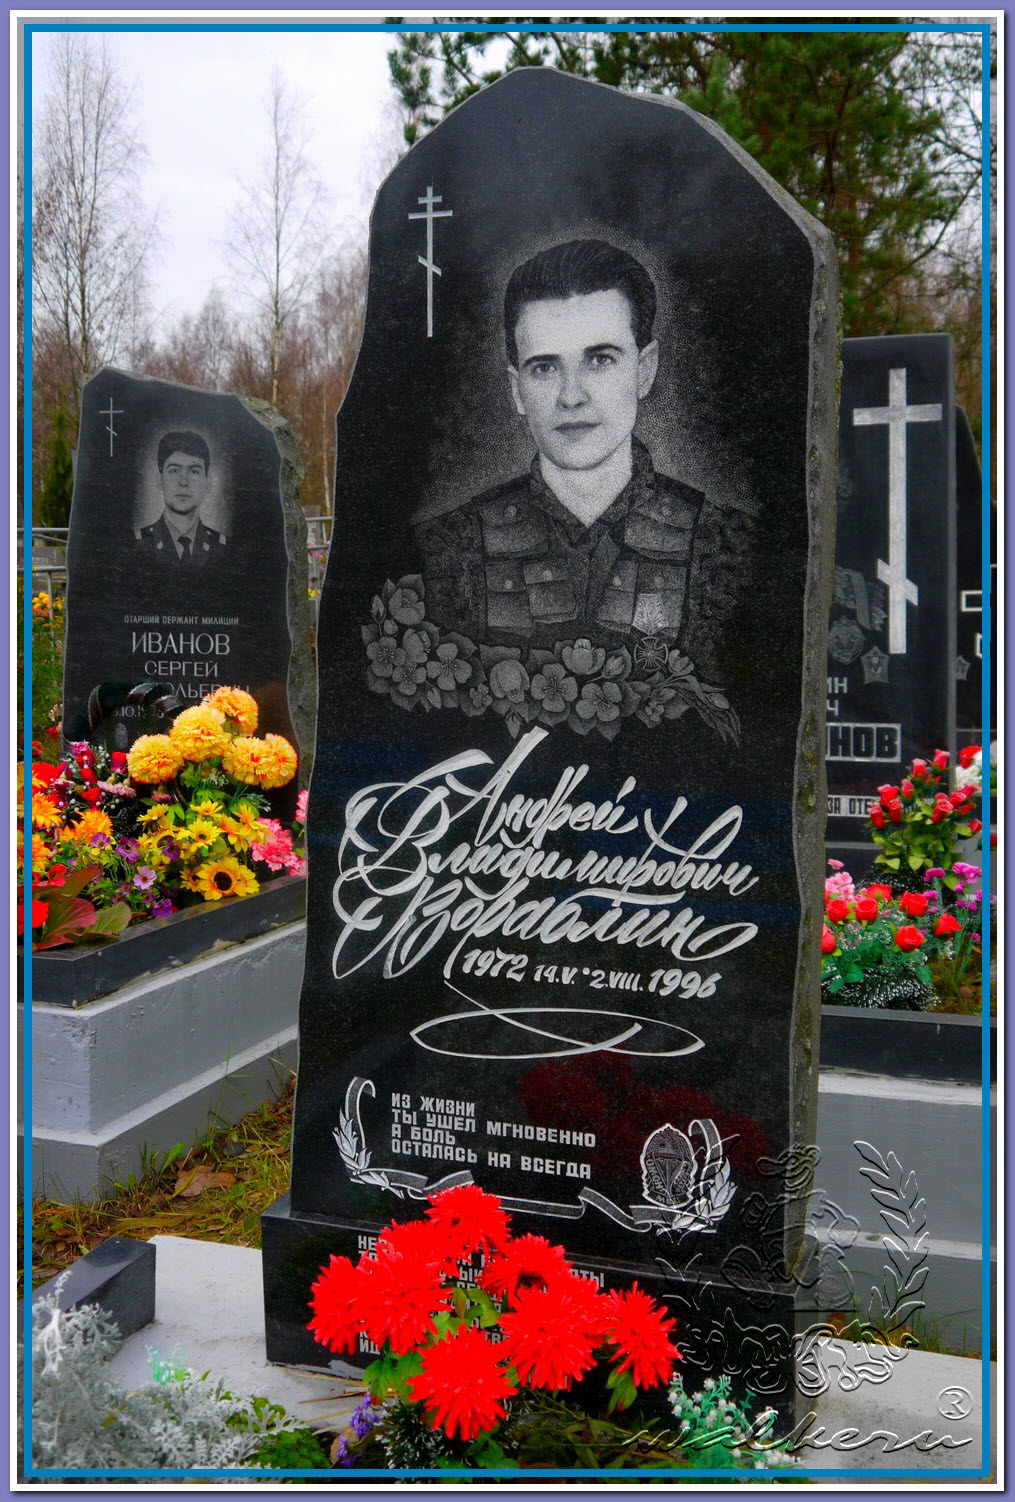 Кораблин Андрей Владимирович